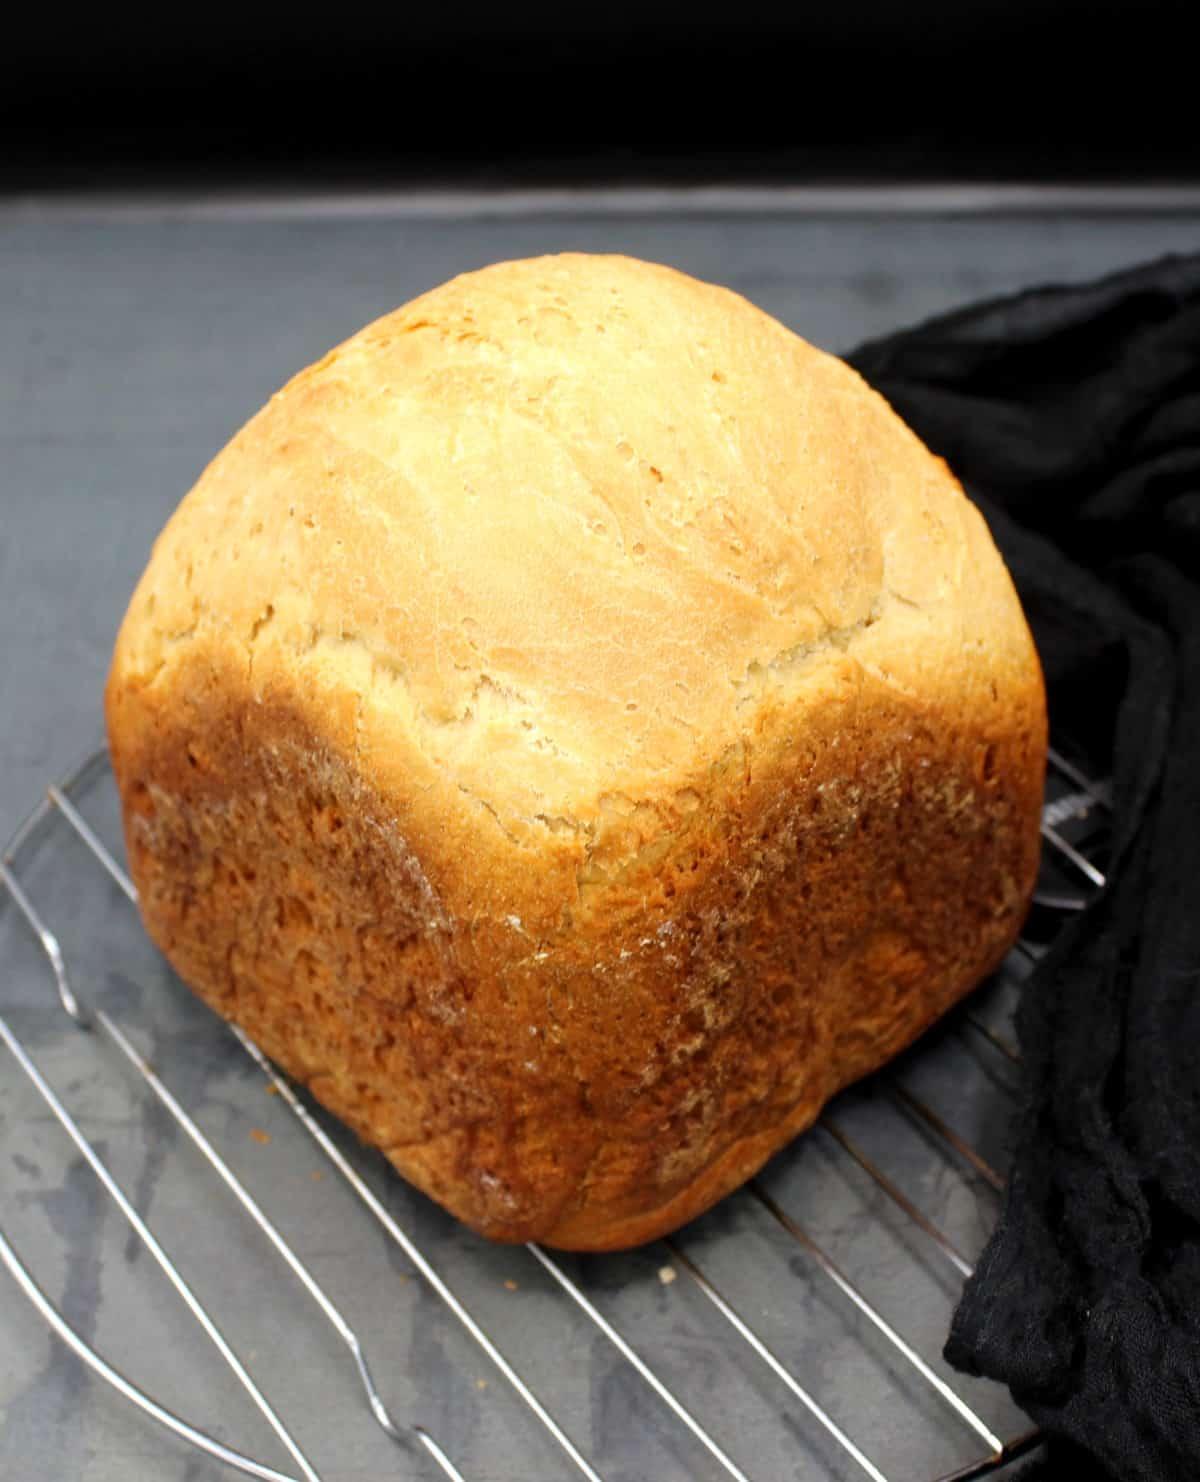 A chubby, beautiful loaf of bread machine sourdough bread.